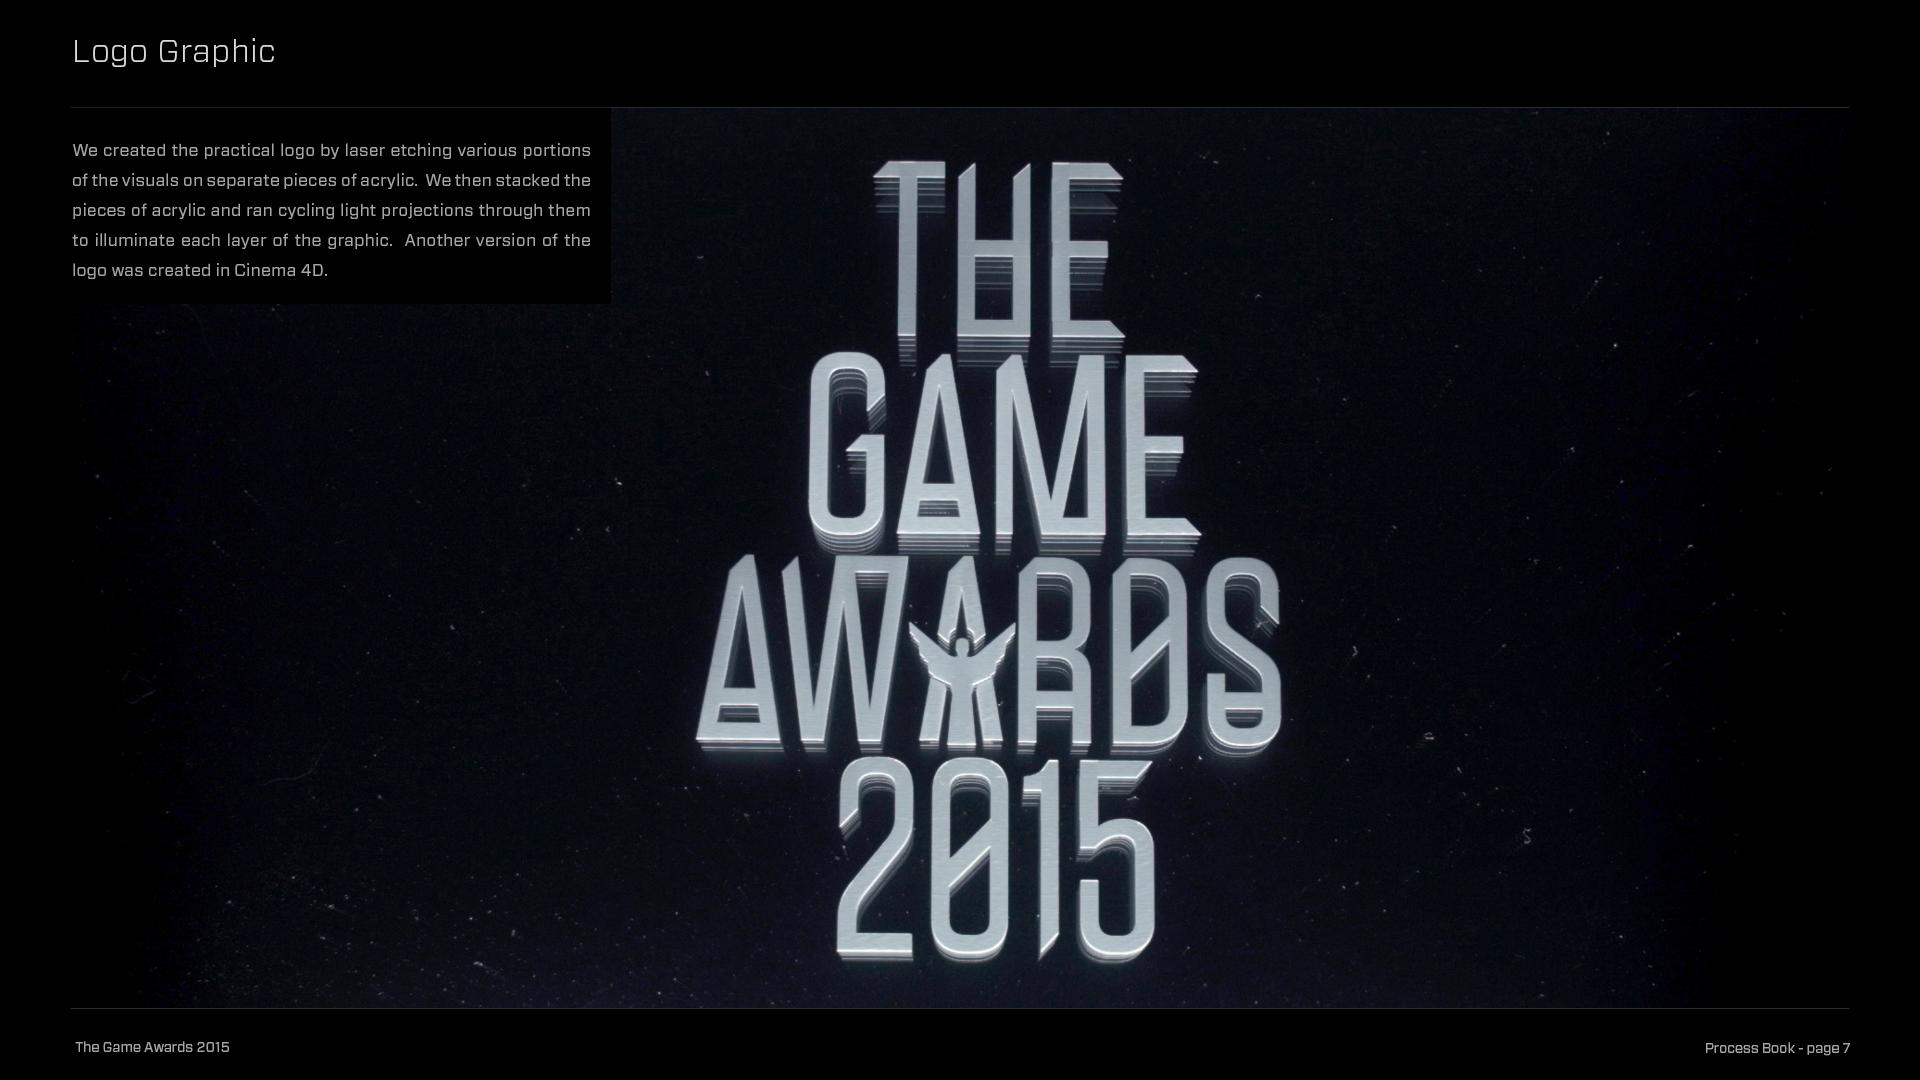 GameAwards2015_ProcessBook7.jpg